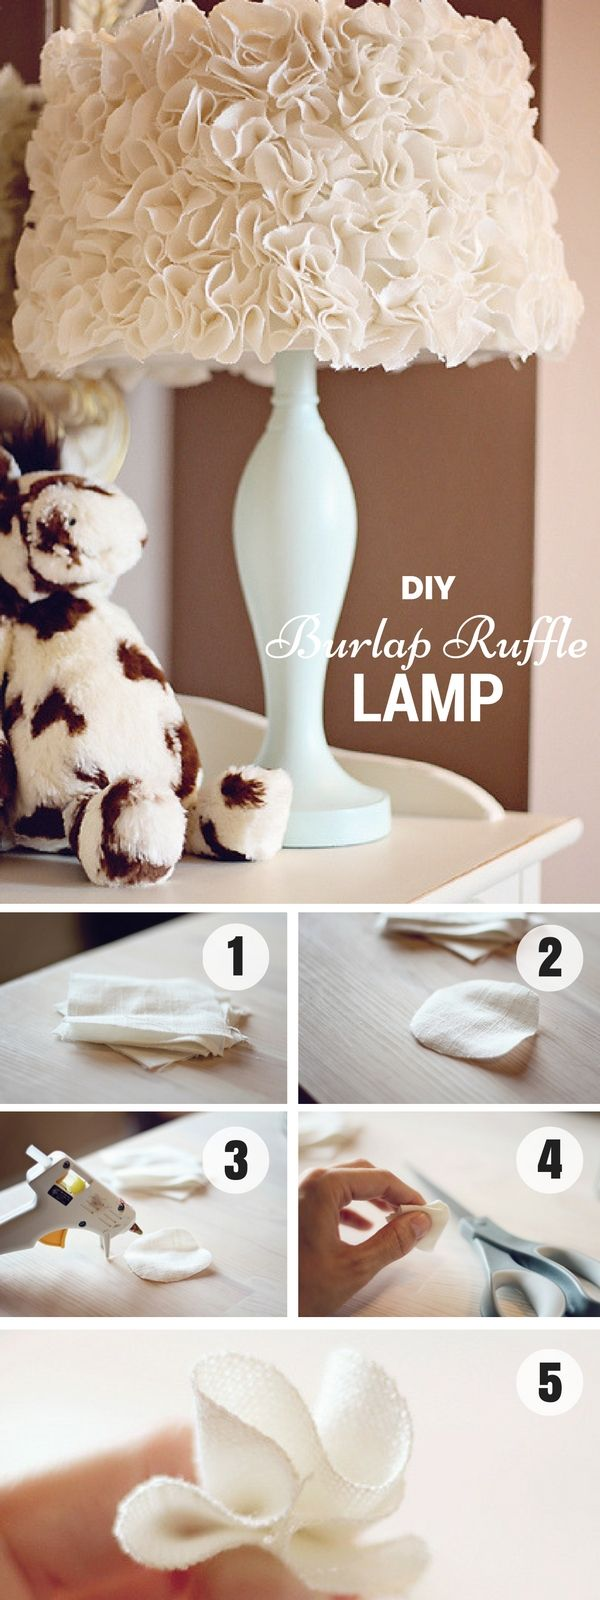 8 Brilliant DIYu0027s To Upgrade Your Room Decor